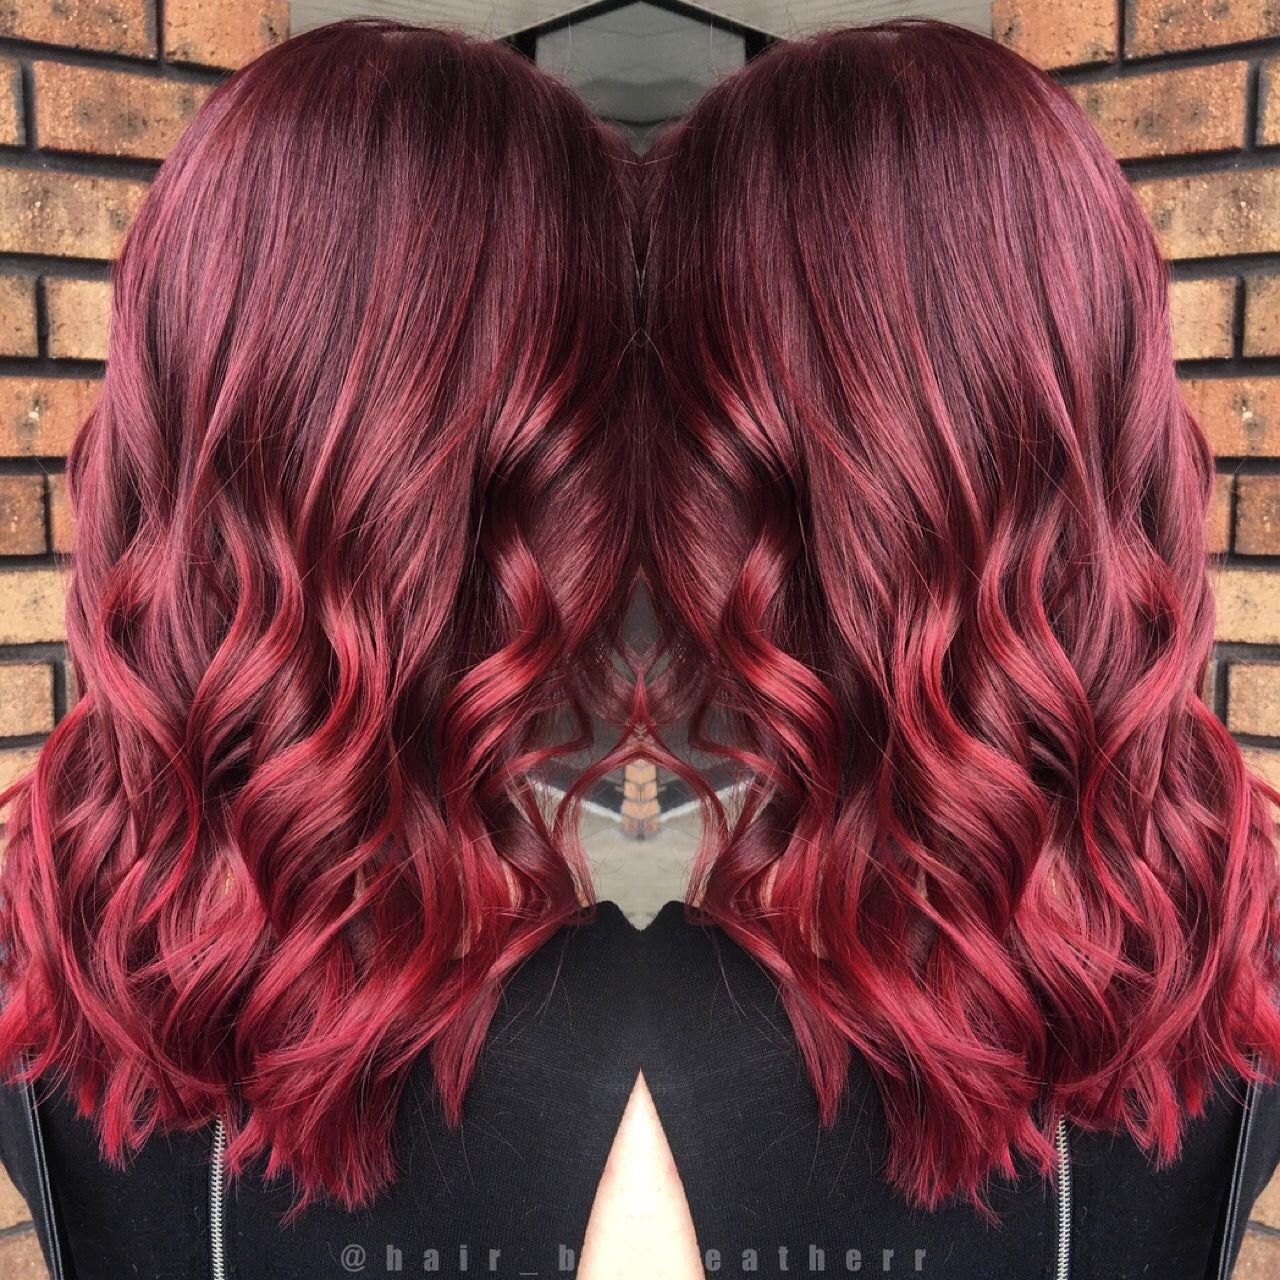 Beautiful Plum Red To Vibrant Red Balayage Ombre Ombre Hair Color Red Balayage Hair Styles